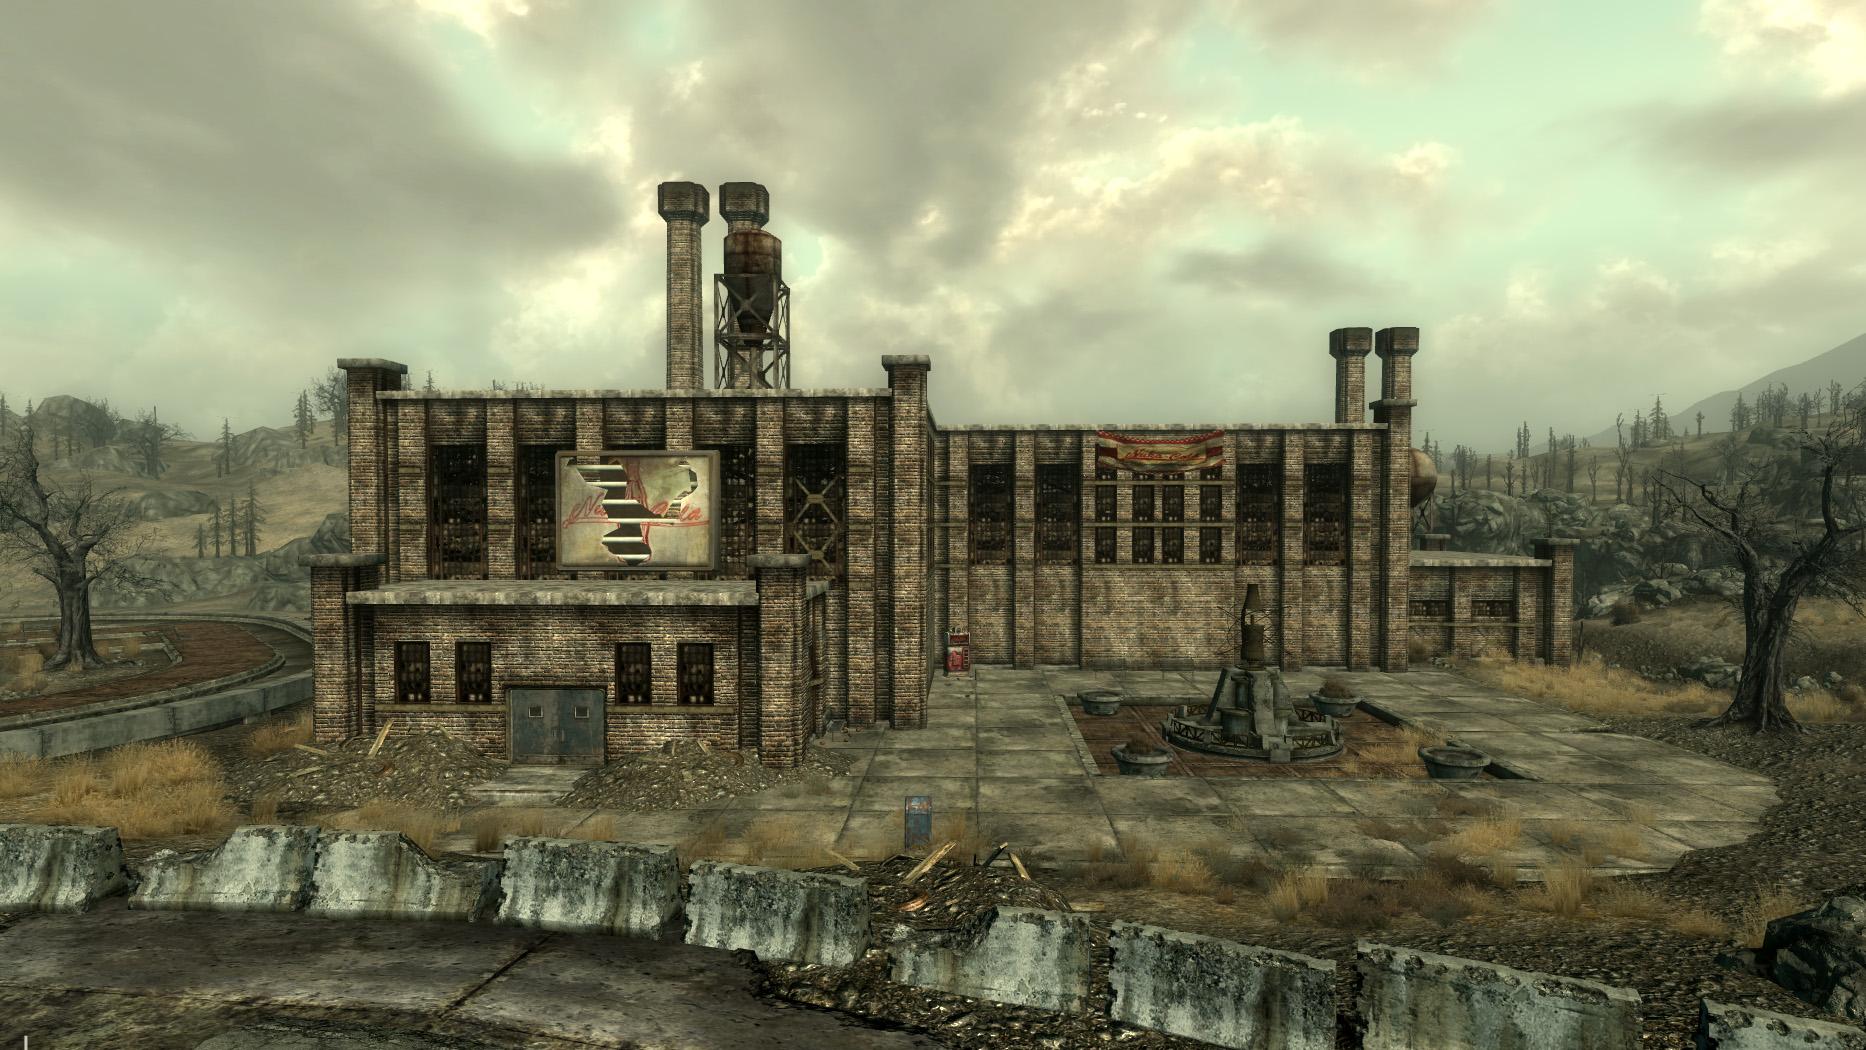 Fallout 4 Nuka Cola Wallpapers Benjamin Stratton